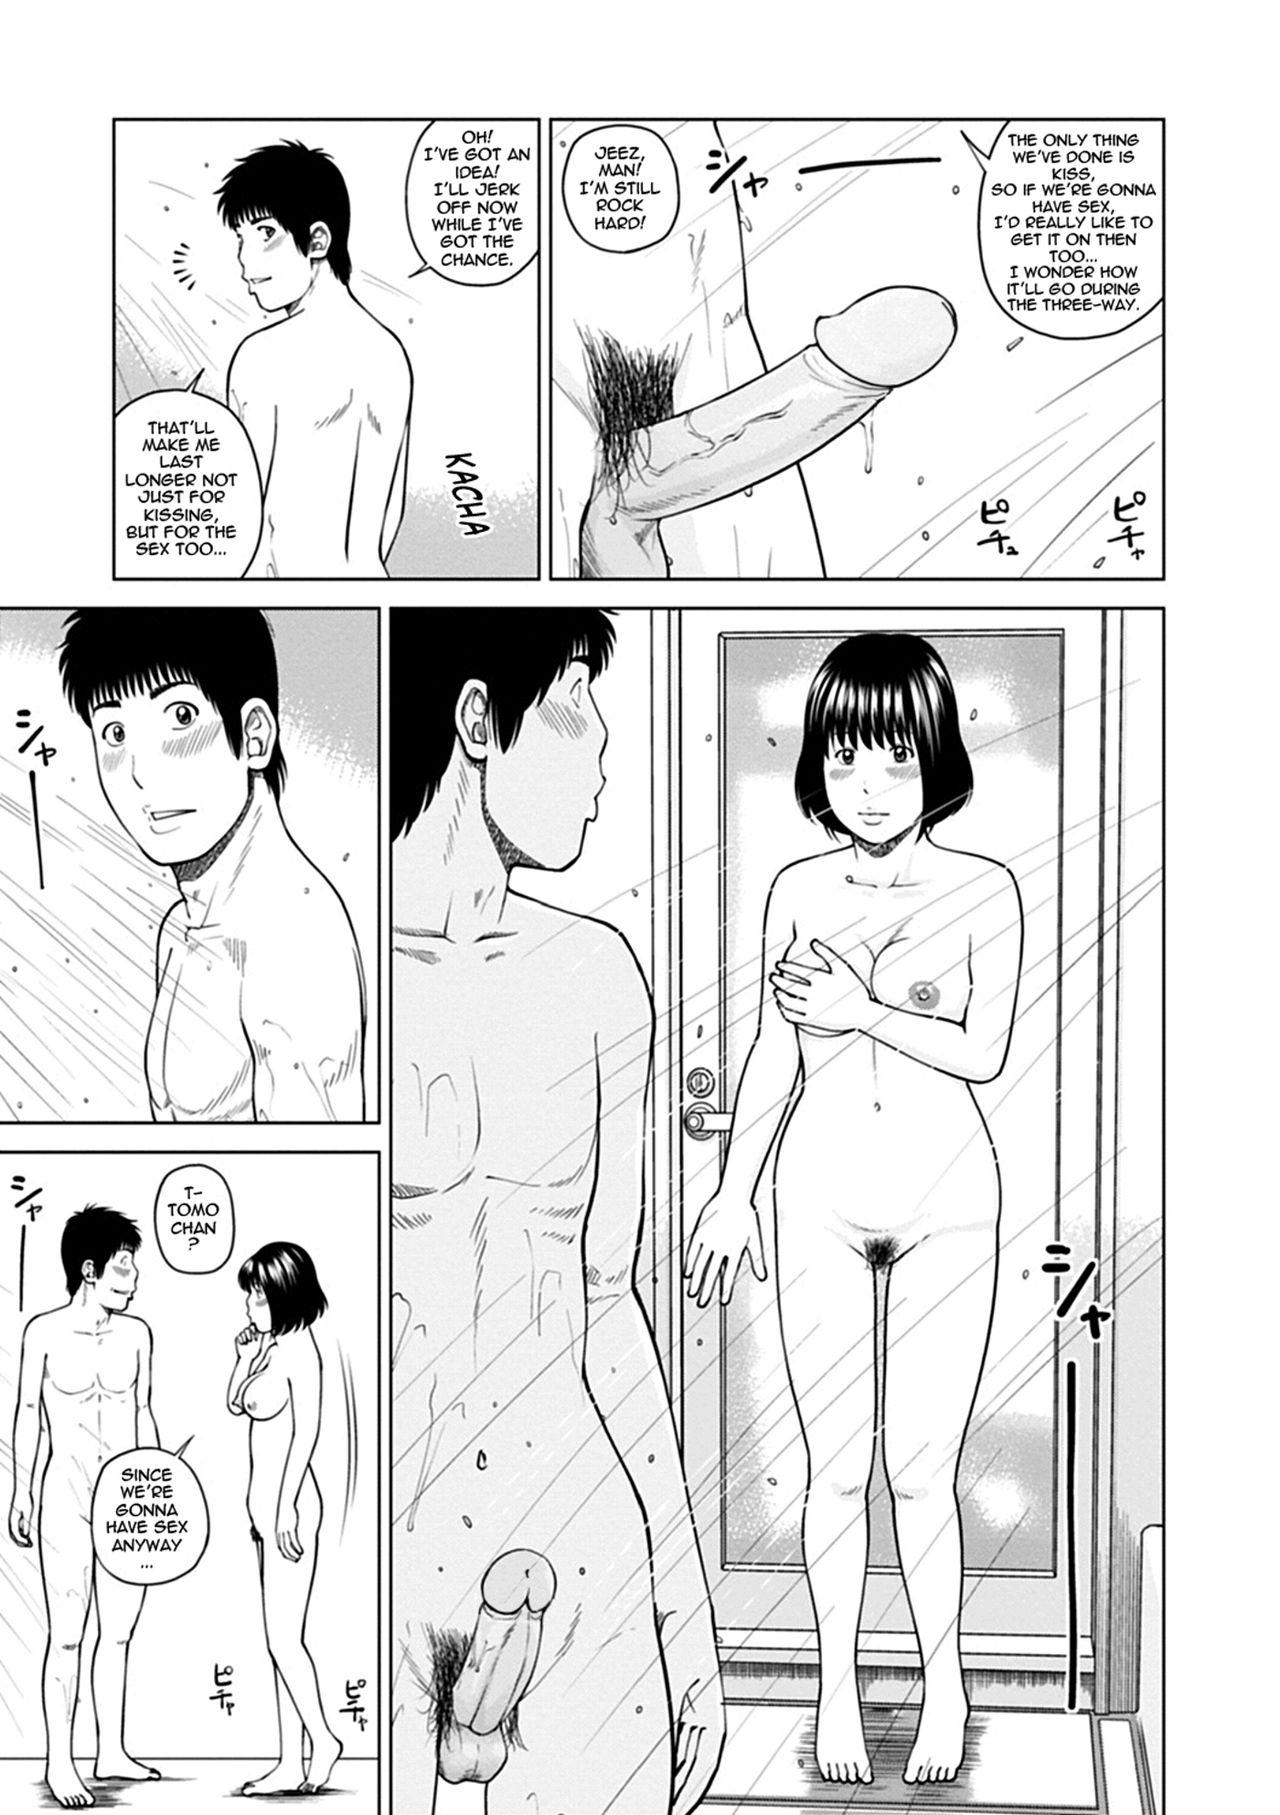 [Kuroki Hidehiko] 36-sai Injuku Sakarizuma | 36-Year-Old Randy Mature Wife [English] {Tadanohito} [Digital] [Uncensored] 112